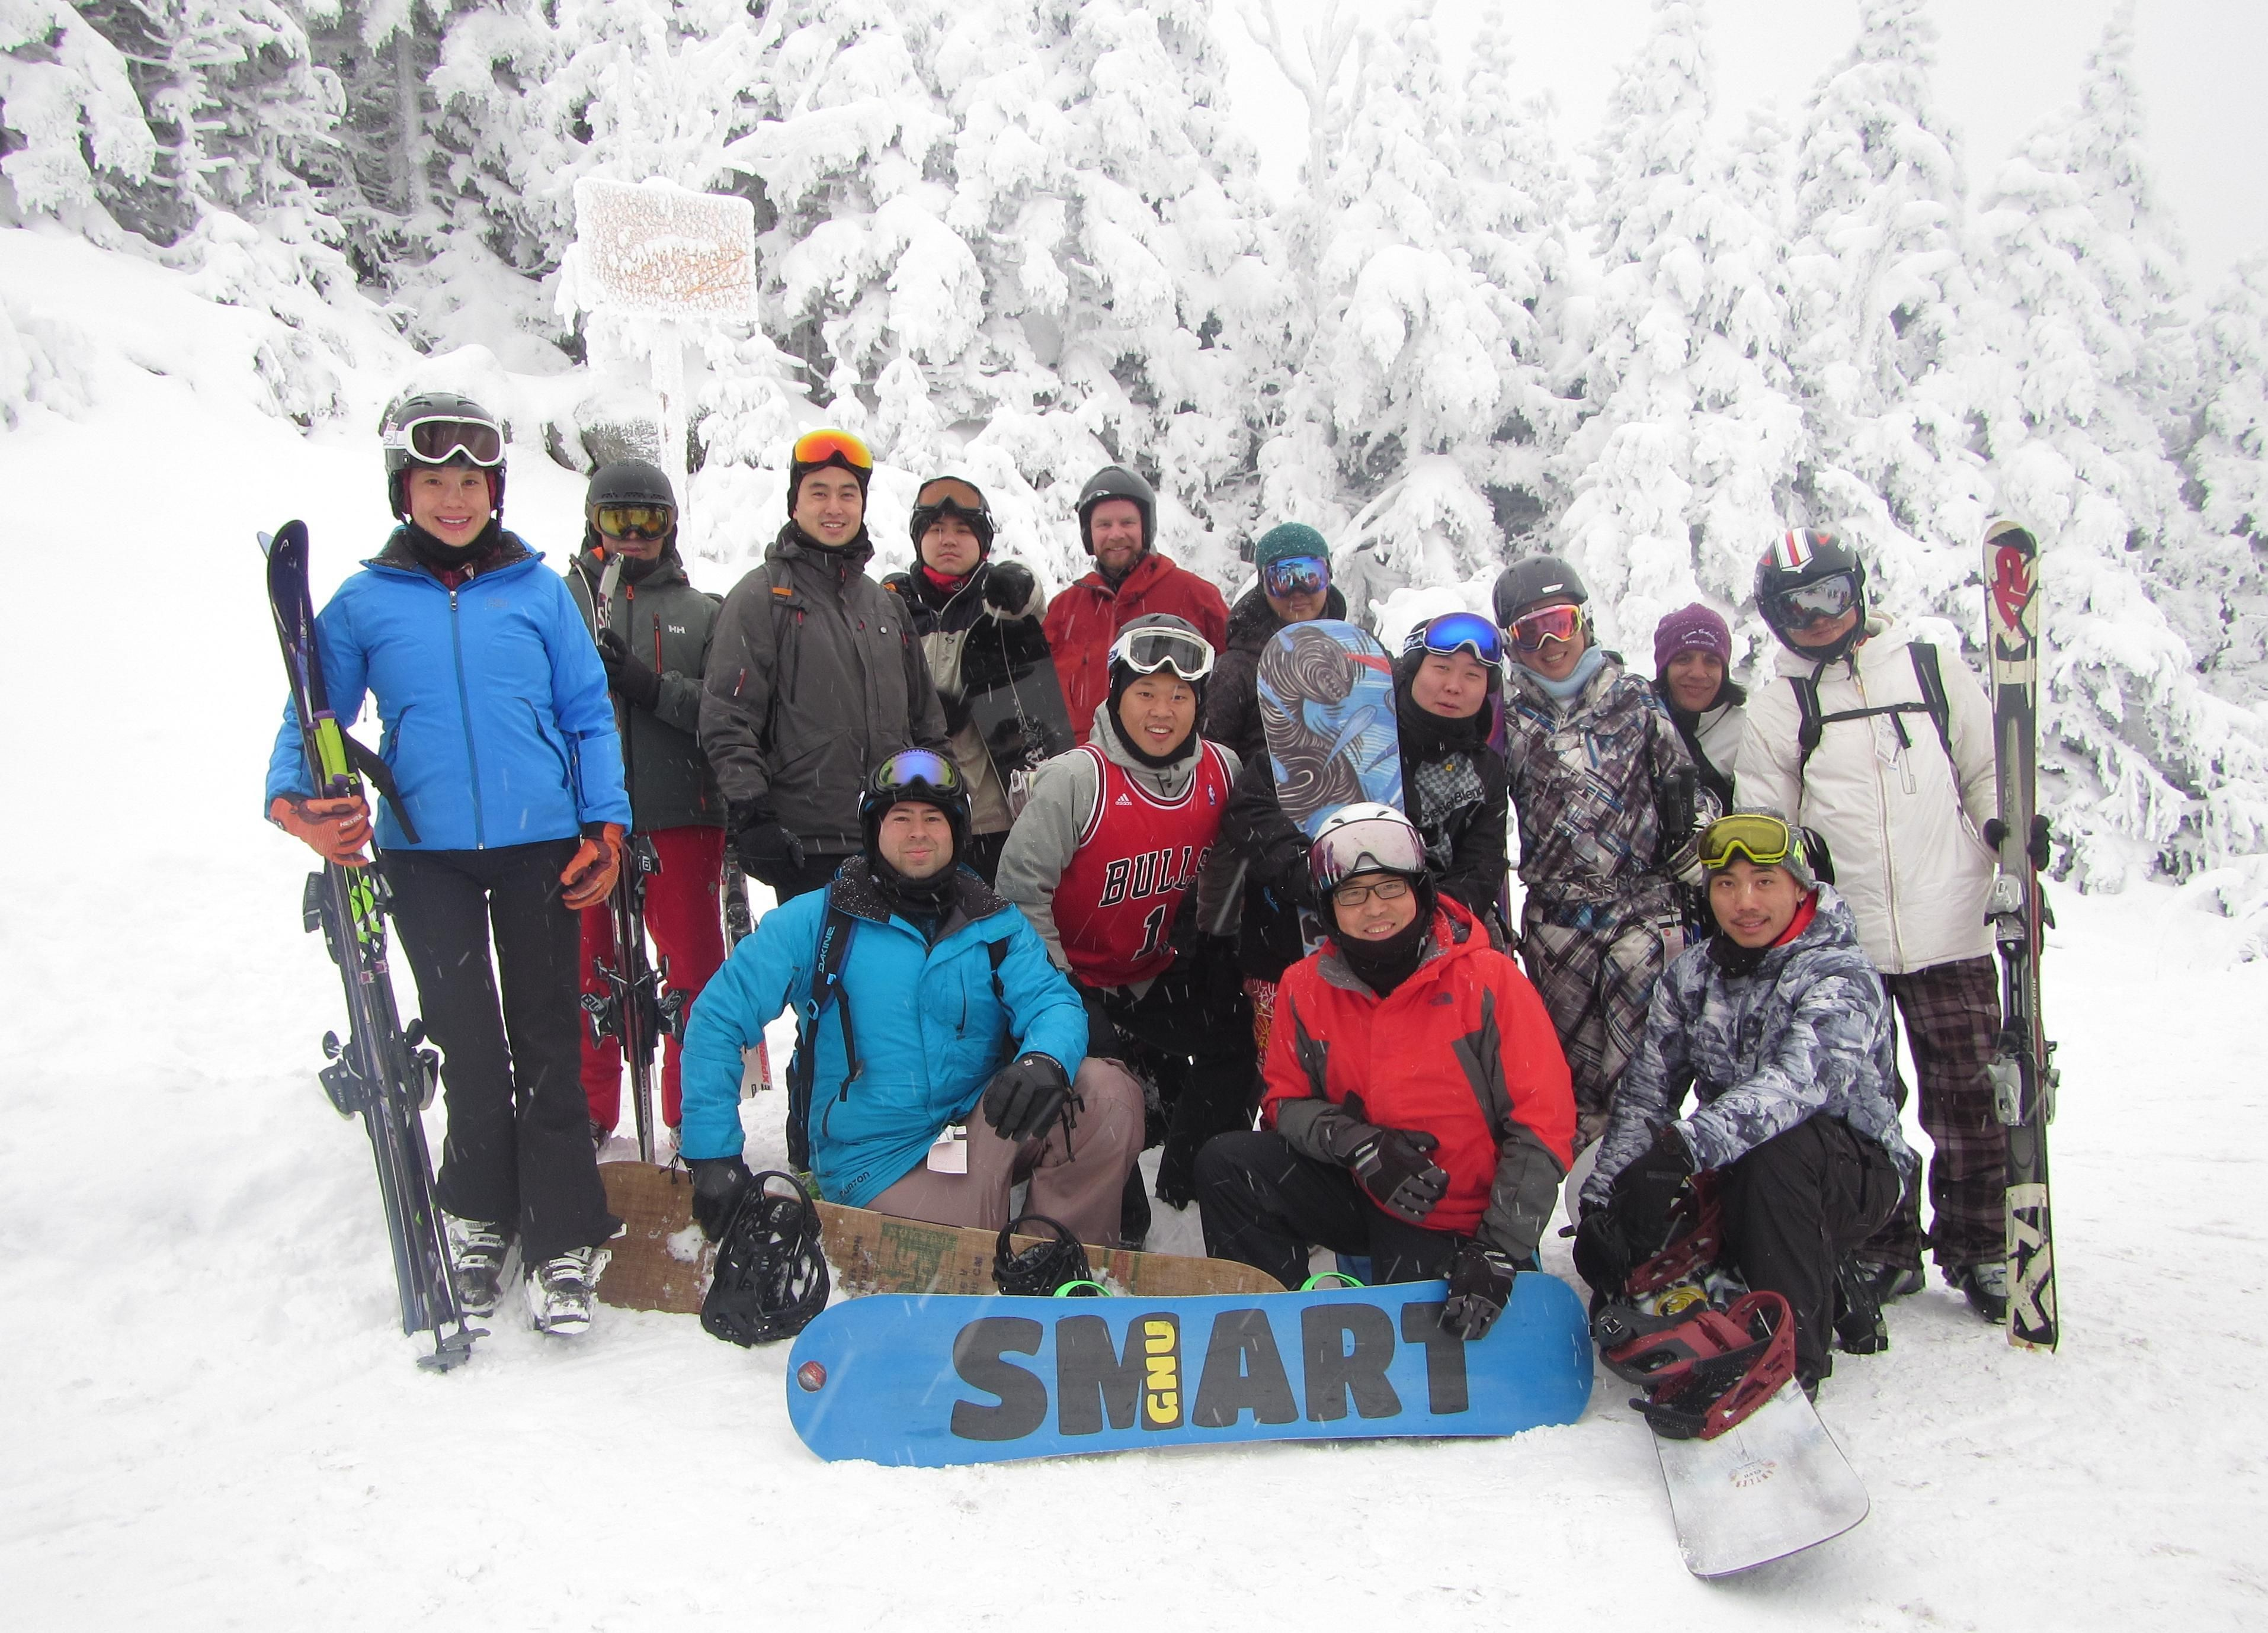 NY Ski & Snowboard Club